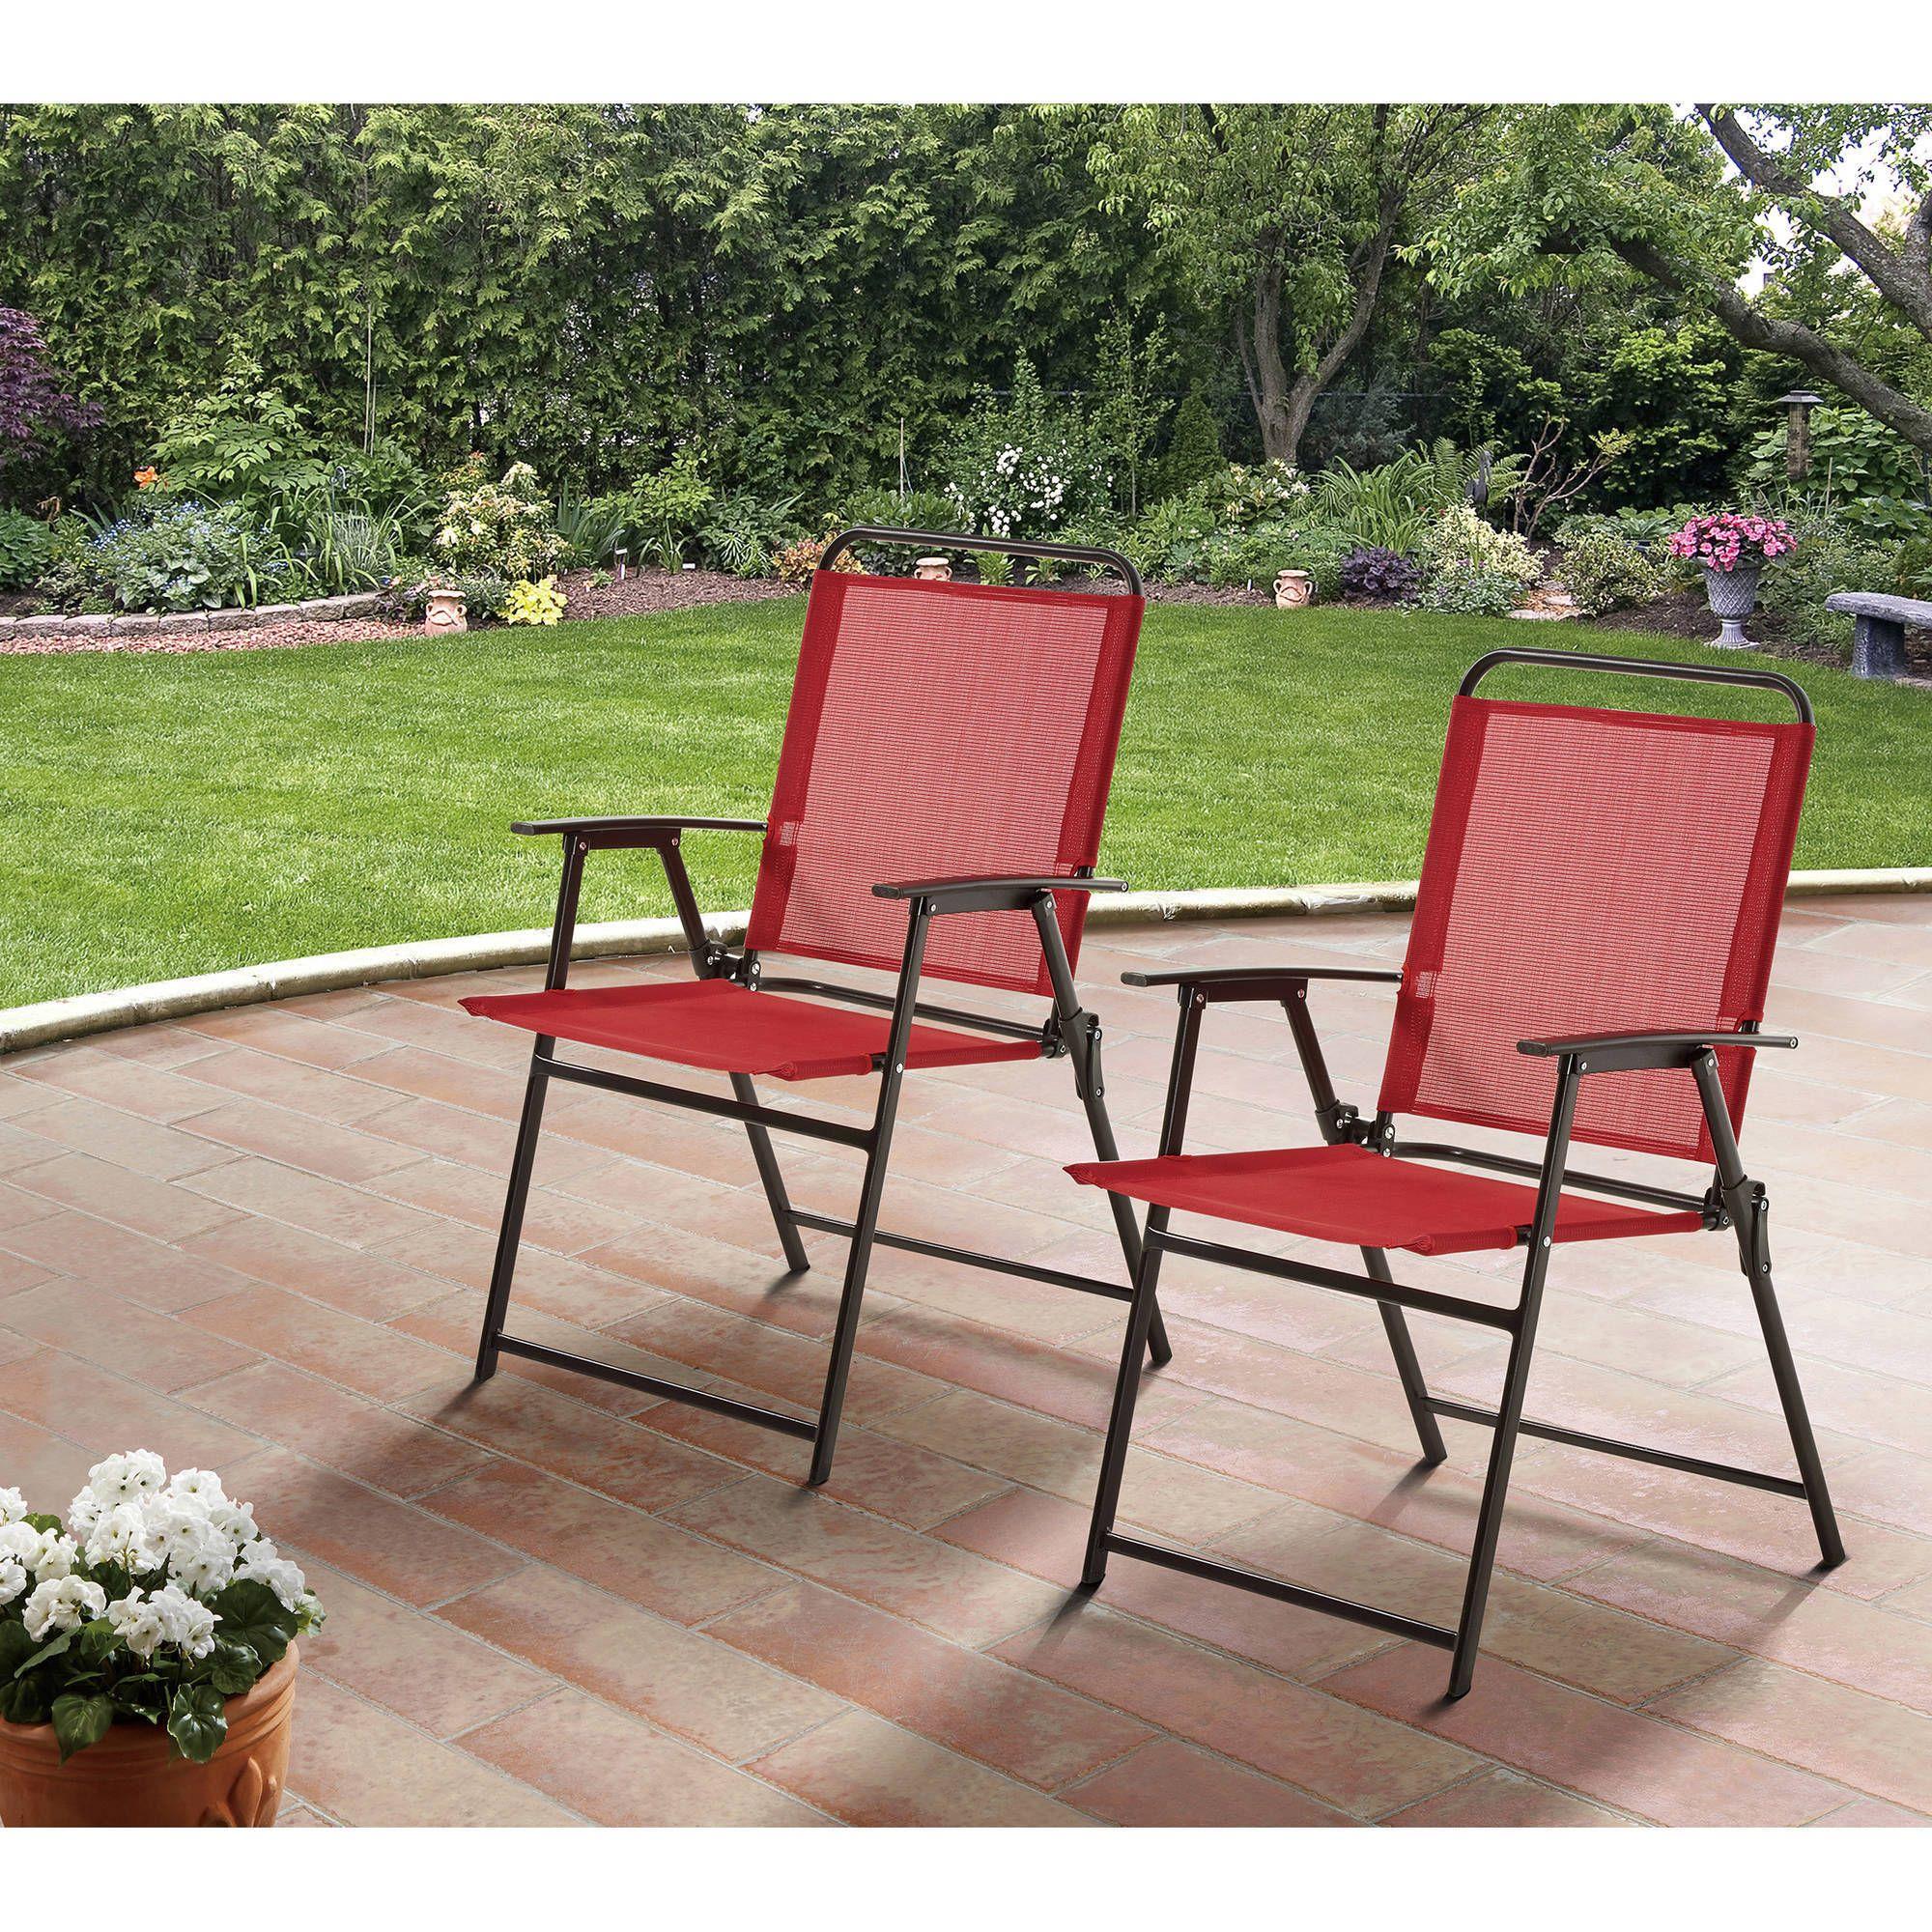 Patio & Garden in 2019 Outdoor folding chairs, Outdoor